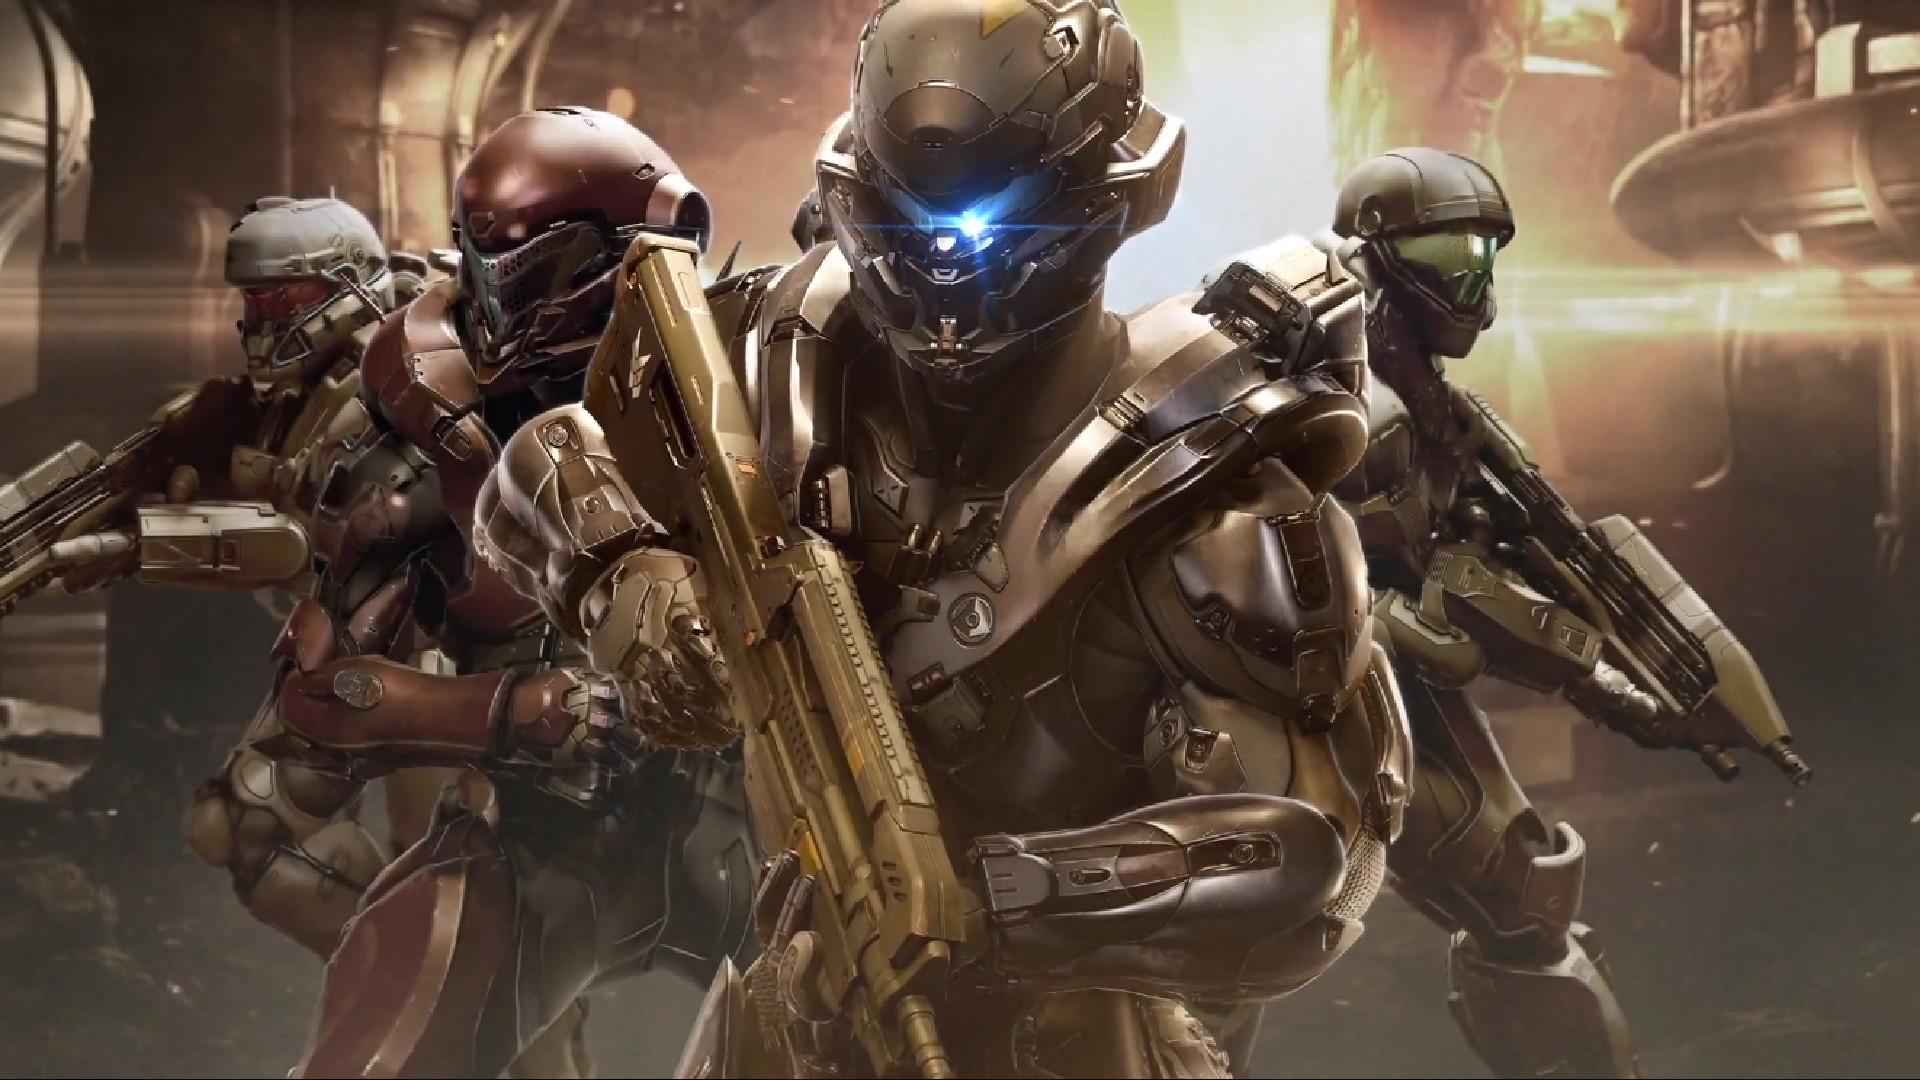 Halo 5 Fireteam Osiris wallpapers full hd